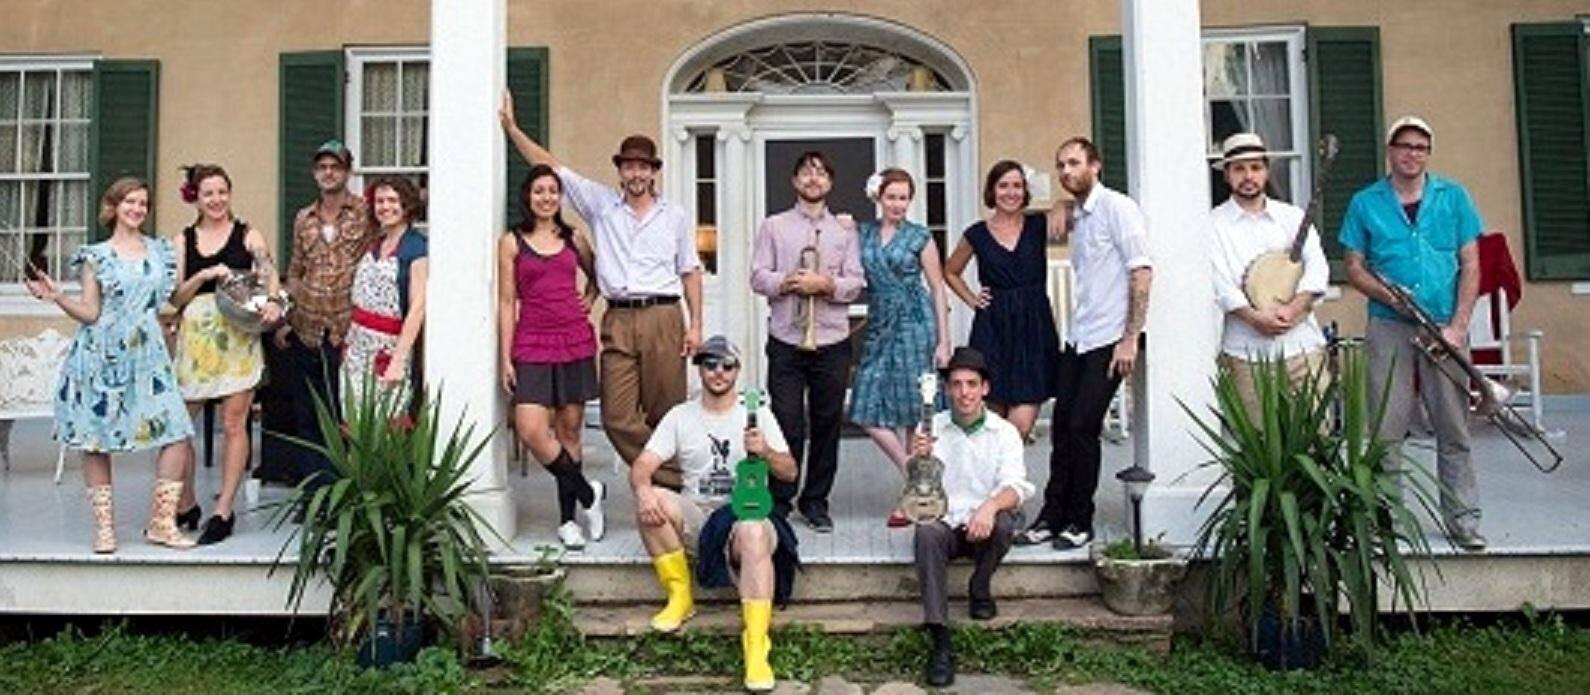 Welbourne Jazz Camp: Music Joins Dance on a Virginia Horse Farm